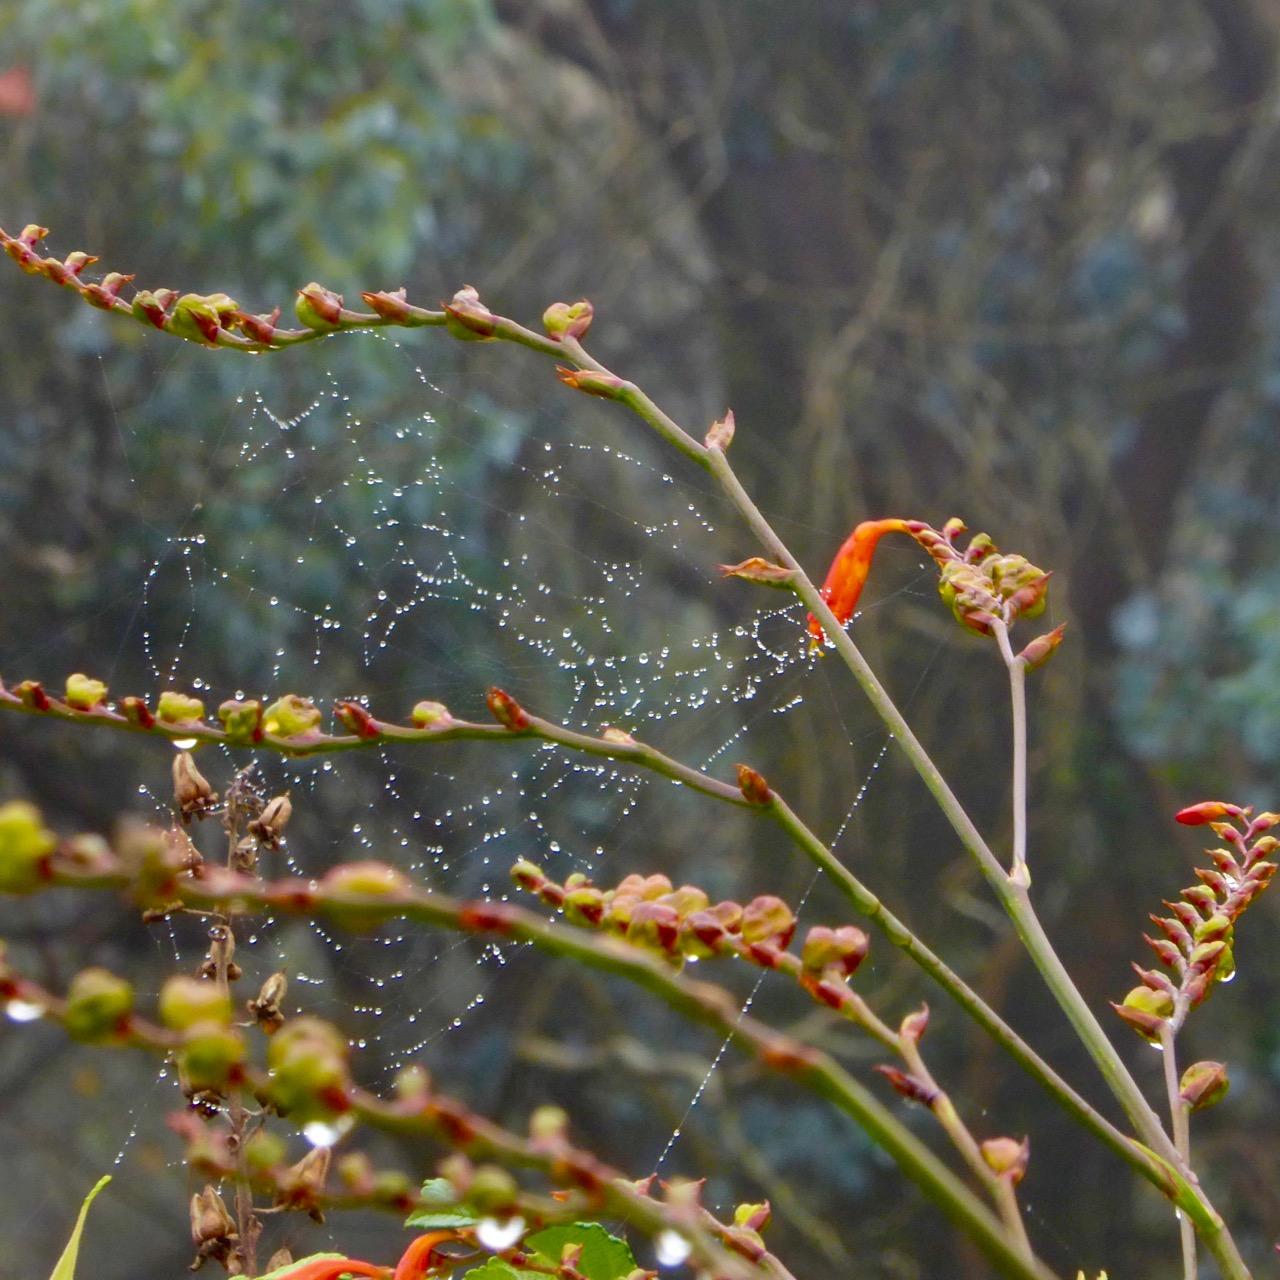 Cobweb on Montbretia